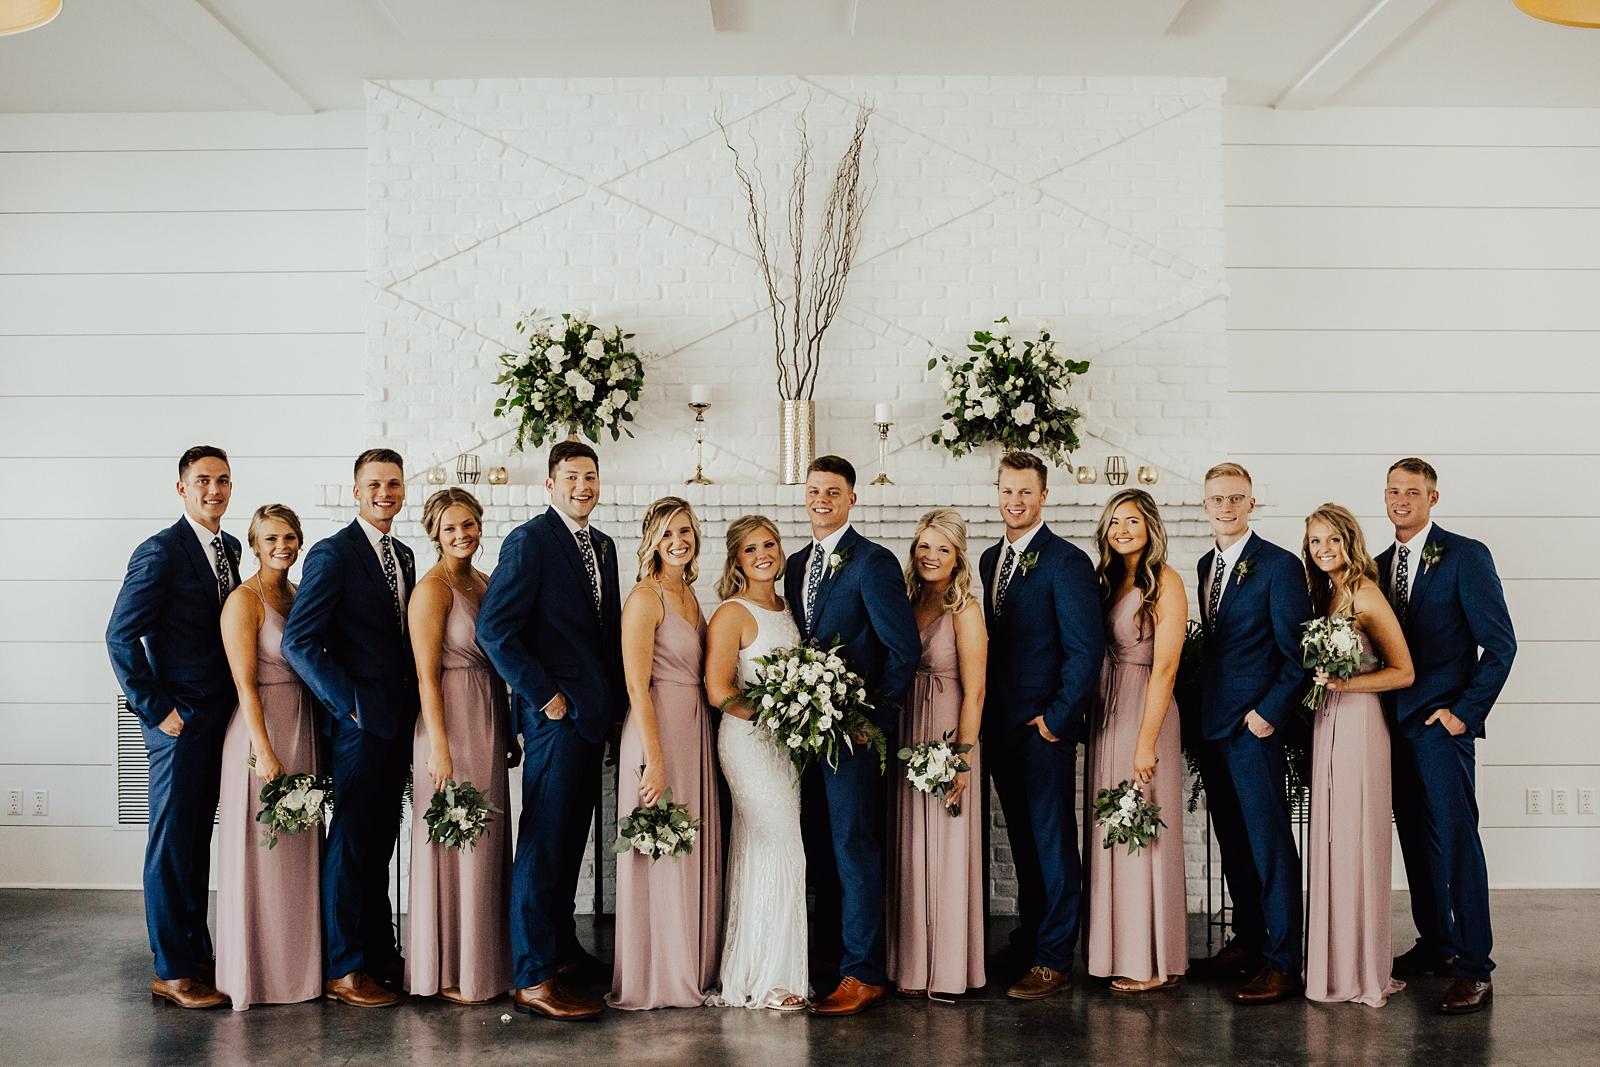 Anna & Trey Modern Minneapolis Wedding at The Hutton House_0706.jpg